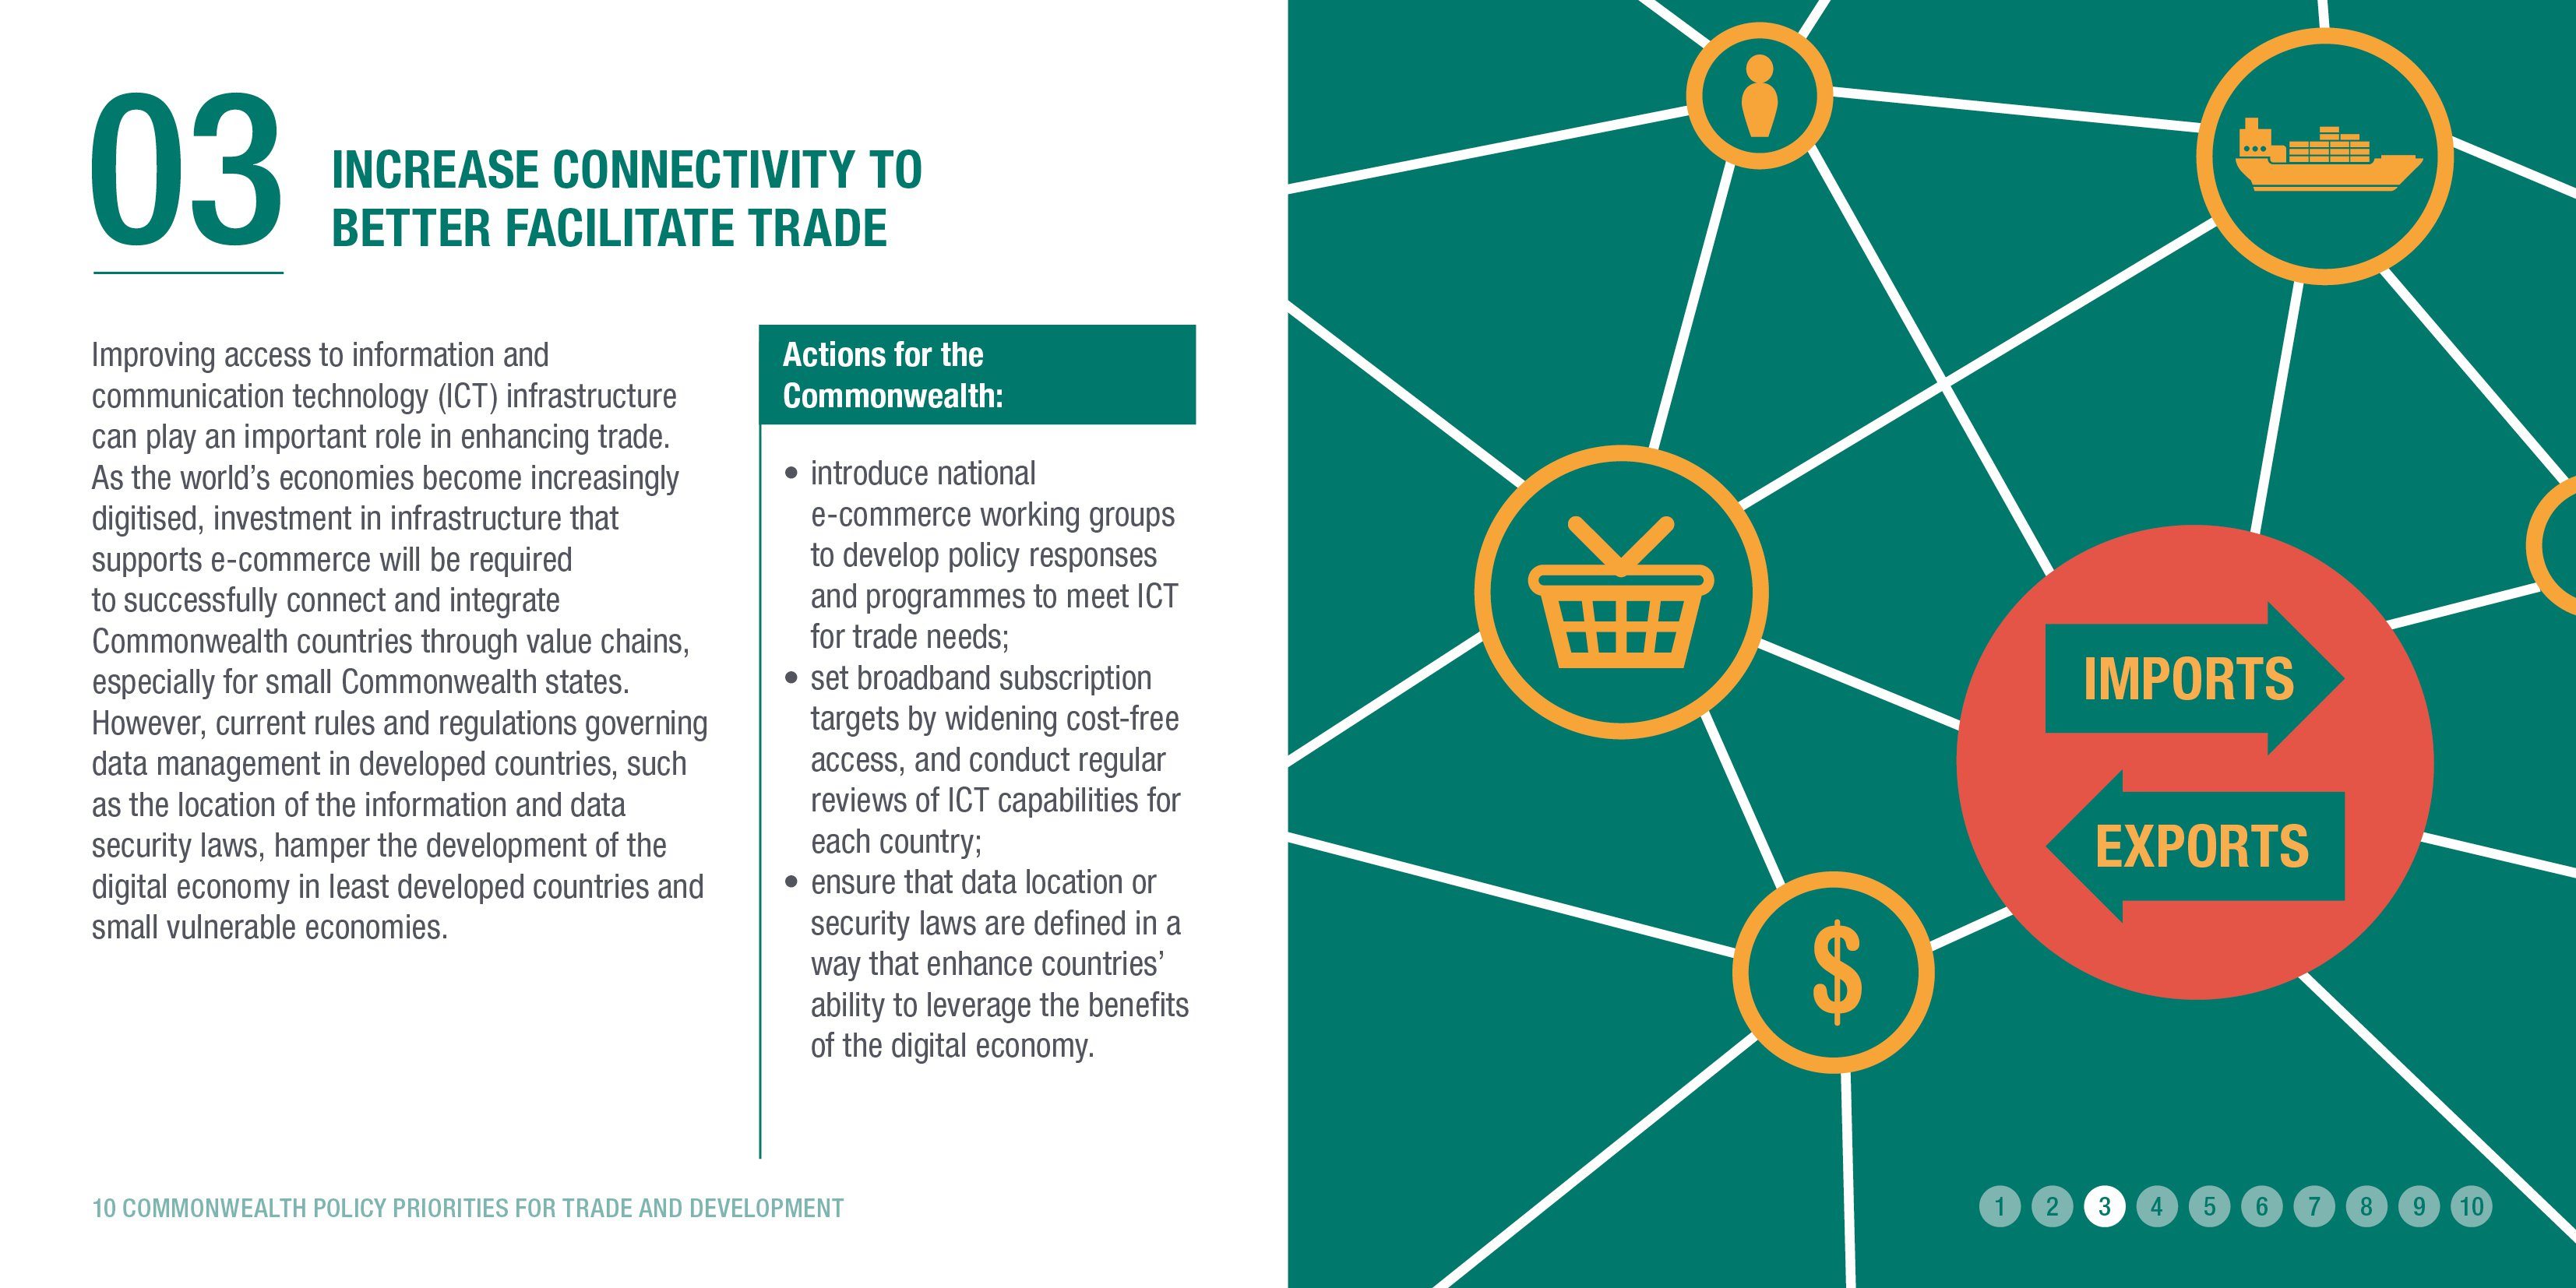 Increase connectivity to better facilitate trade